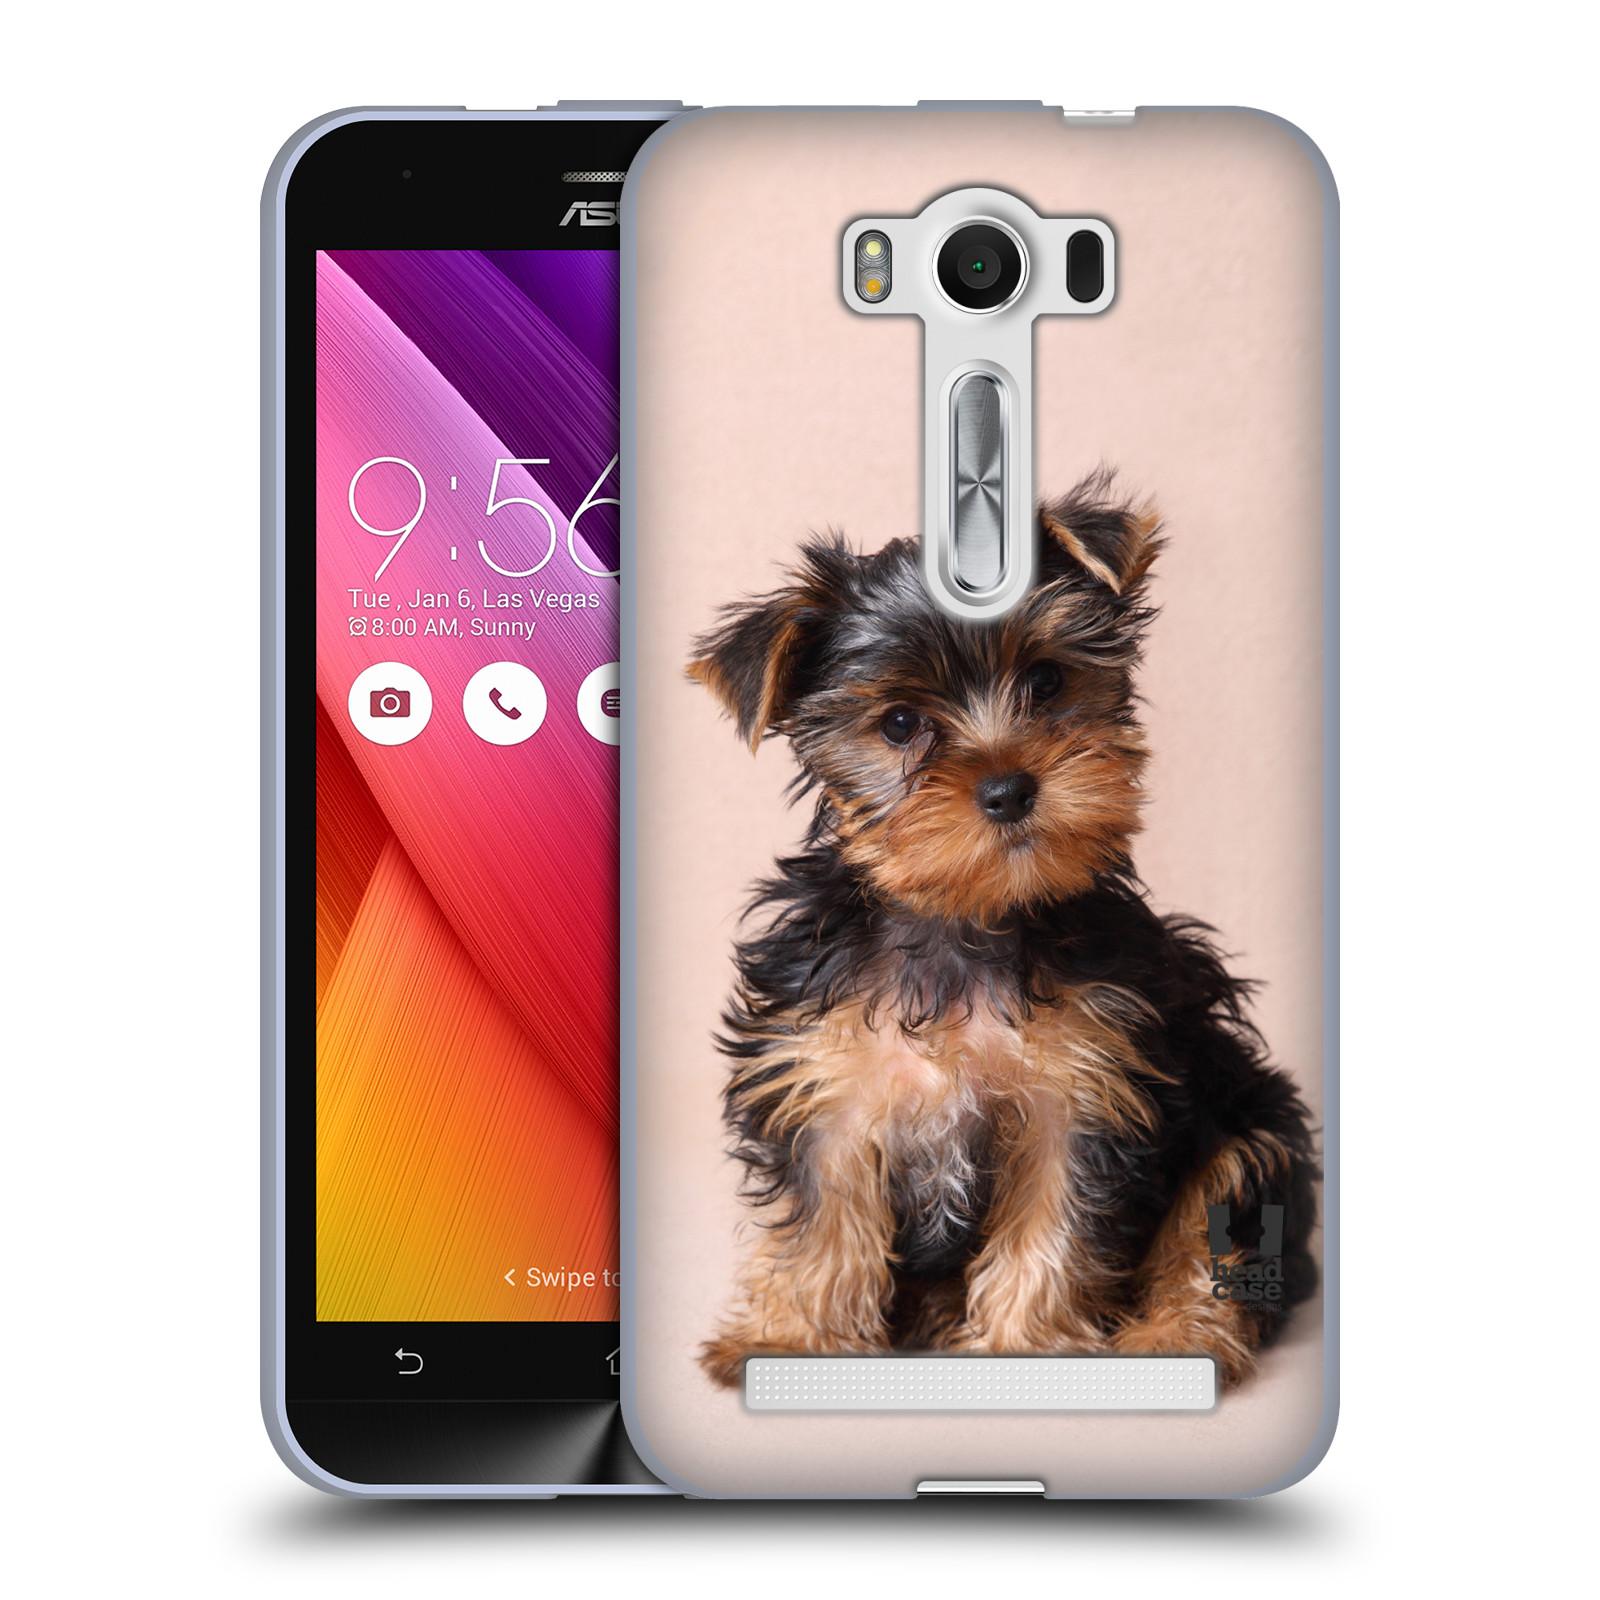 "Silikonové pouzdro na mobil Asus ZenFone 2 Laser ZE500KL HEAD CASE YORKŠÍR (Silikonový kryt či obal na mobilní telefon Asus ZenFone 2 Laser ZE500KL s 5"" displejem)"